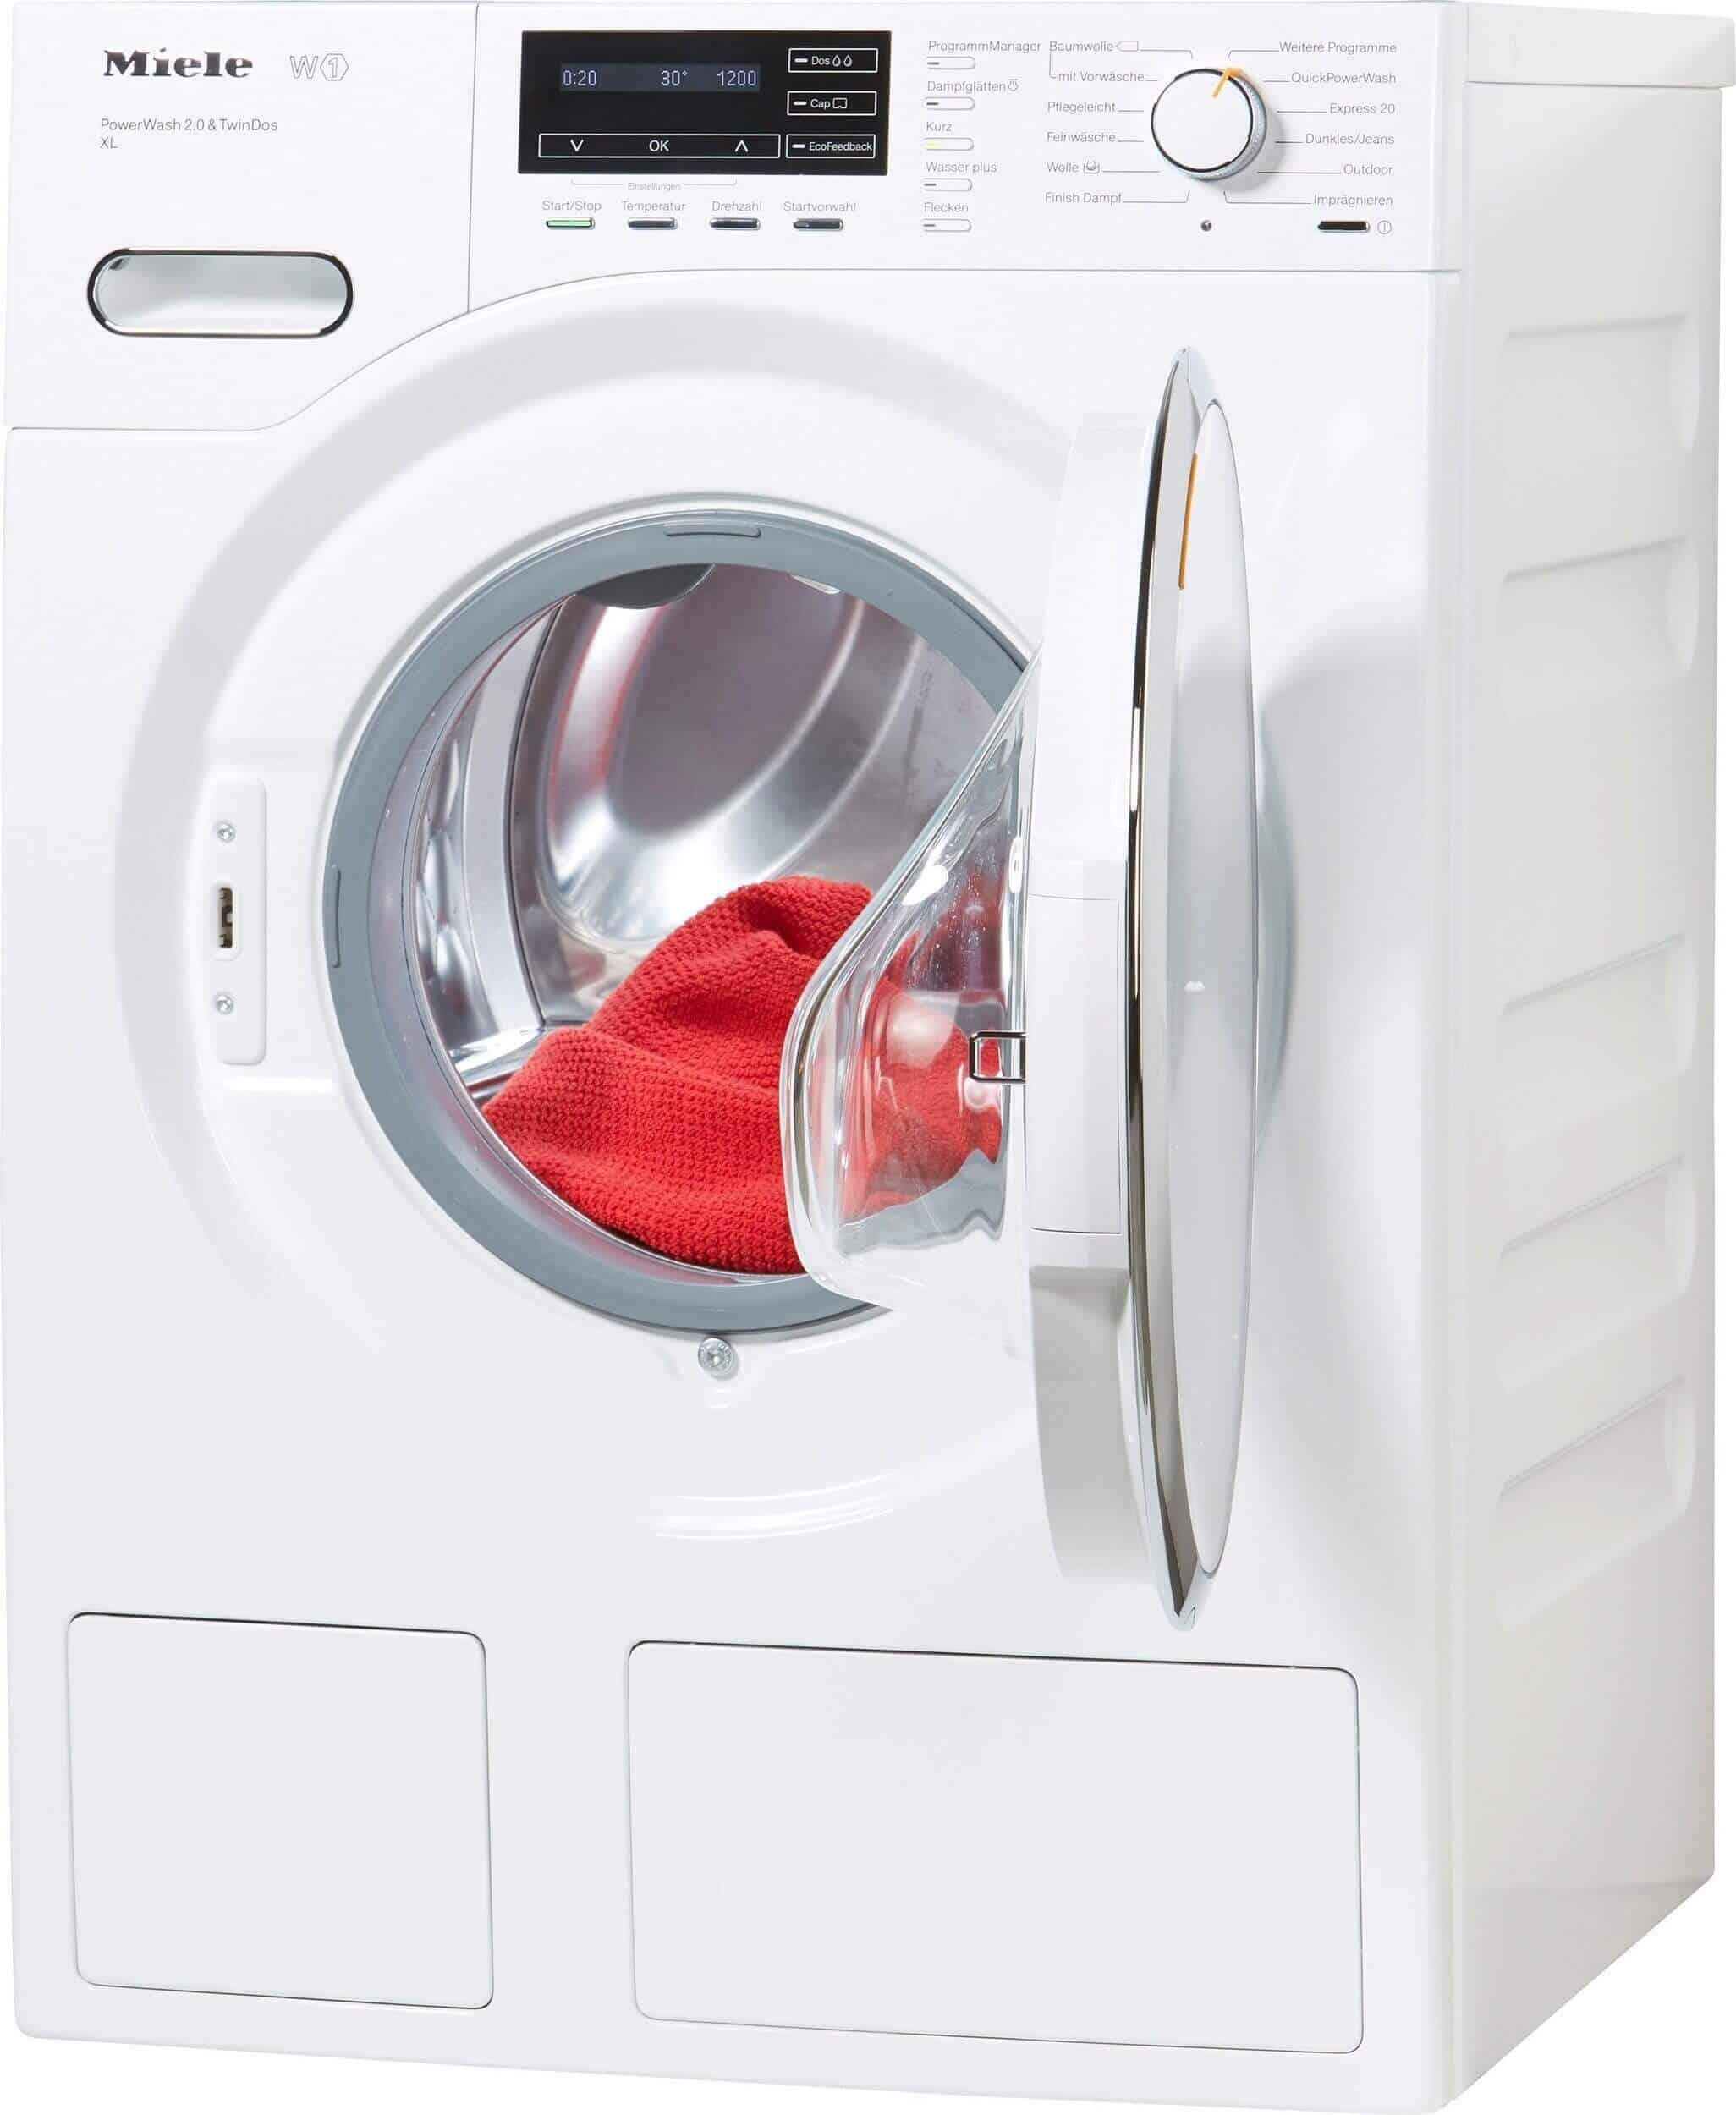 miele wmh 262 wps waschmaschine im test 07 2018. Black Bedroom Furniture Sets. Home Design Ideas